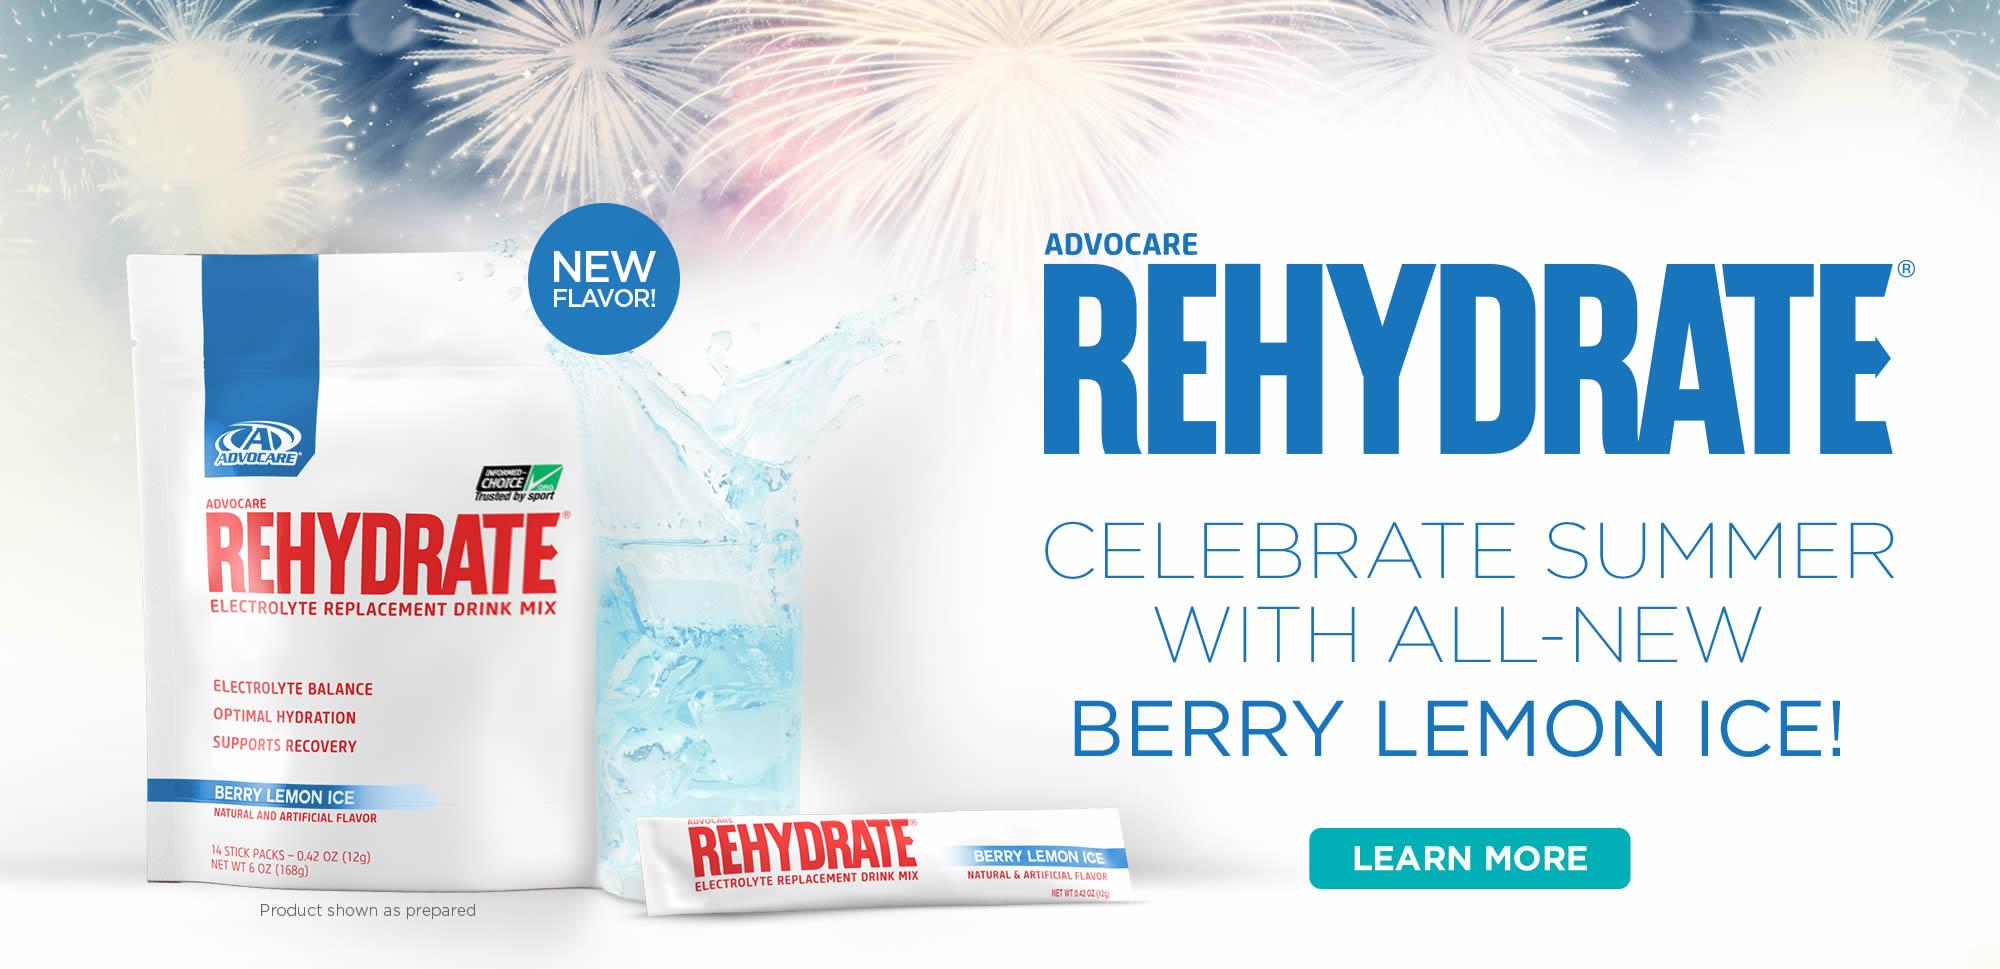 Rehydrate - Berry Lemon Ice